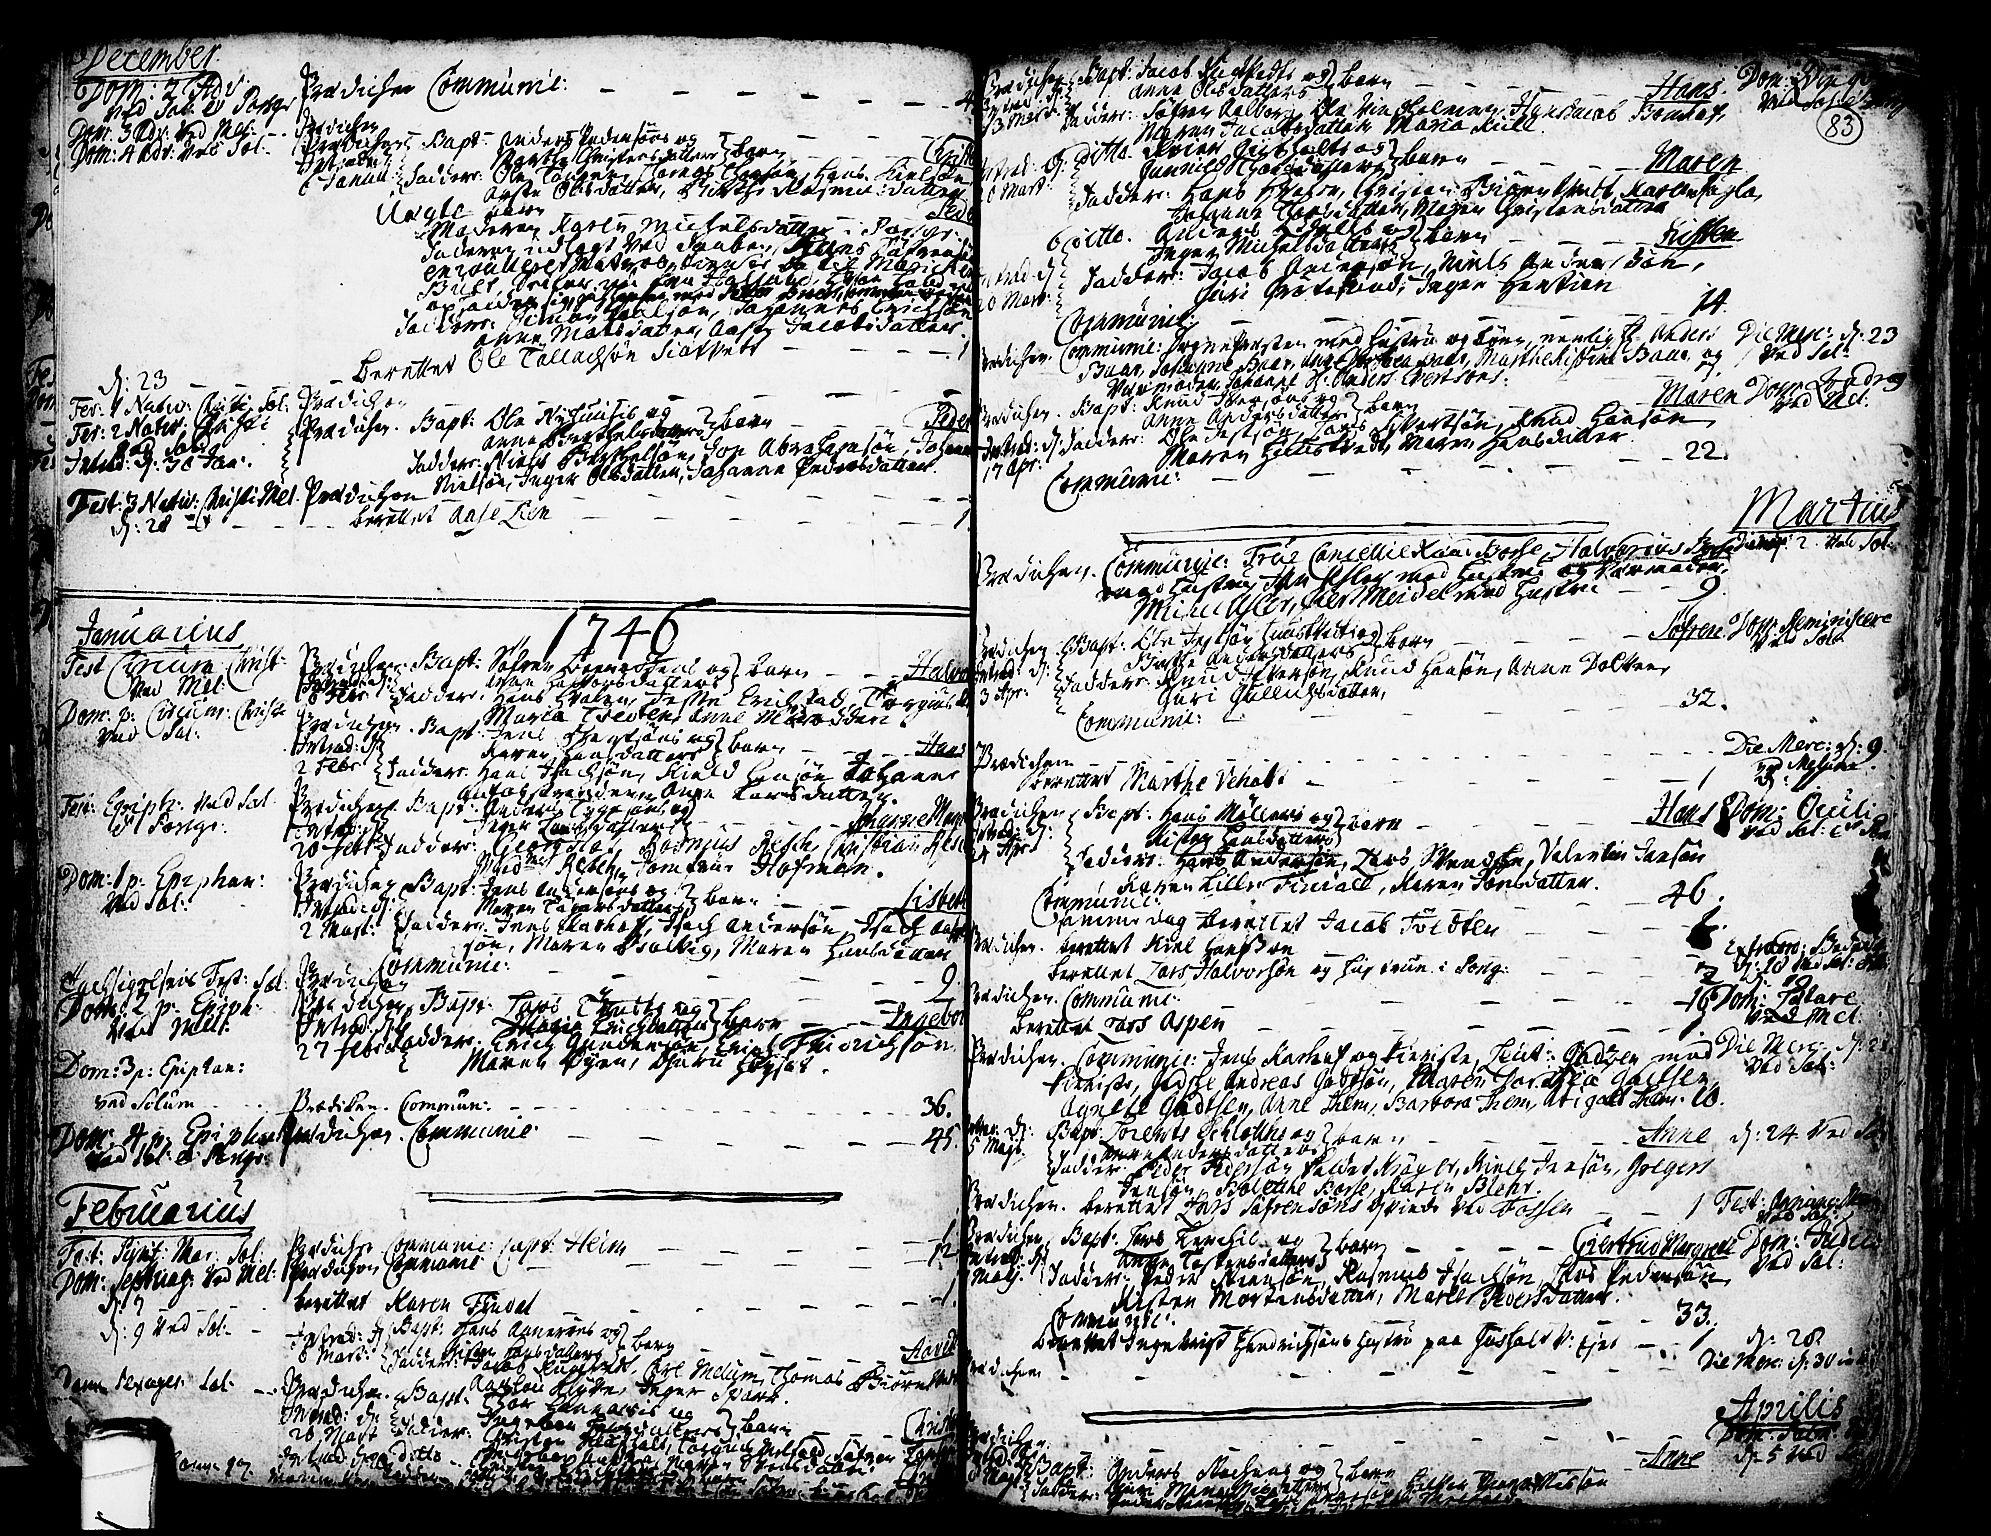 SAKO, Solum kirkebøker, F/Fa/L0002: Ministerialbok nr. I 2, 1713-1761, s. 83